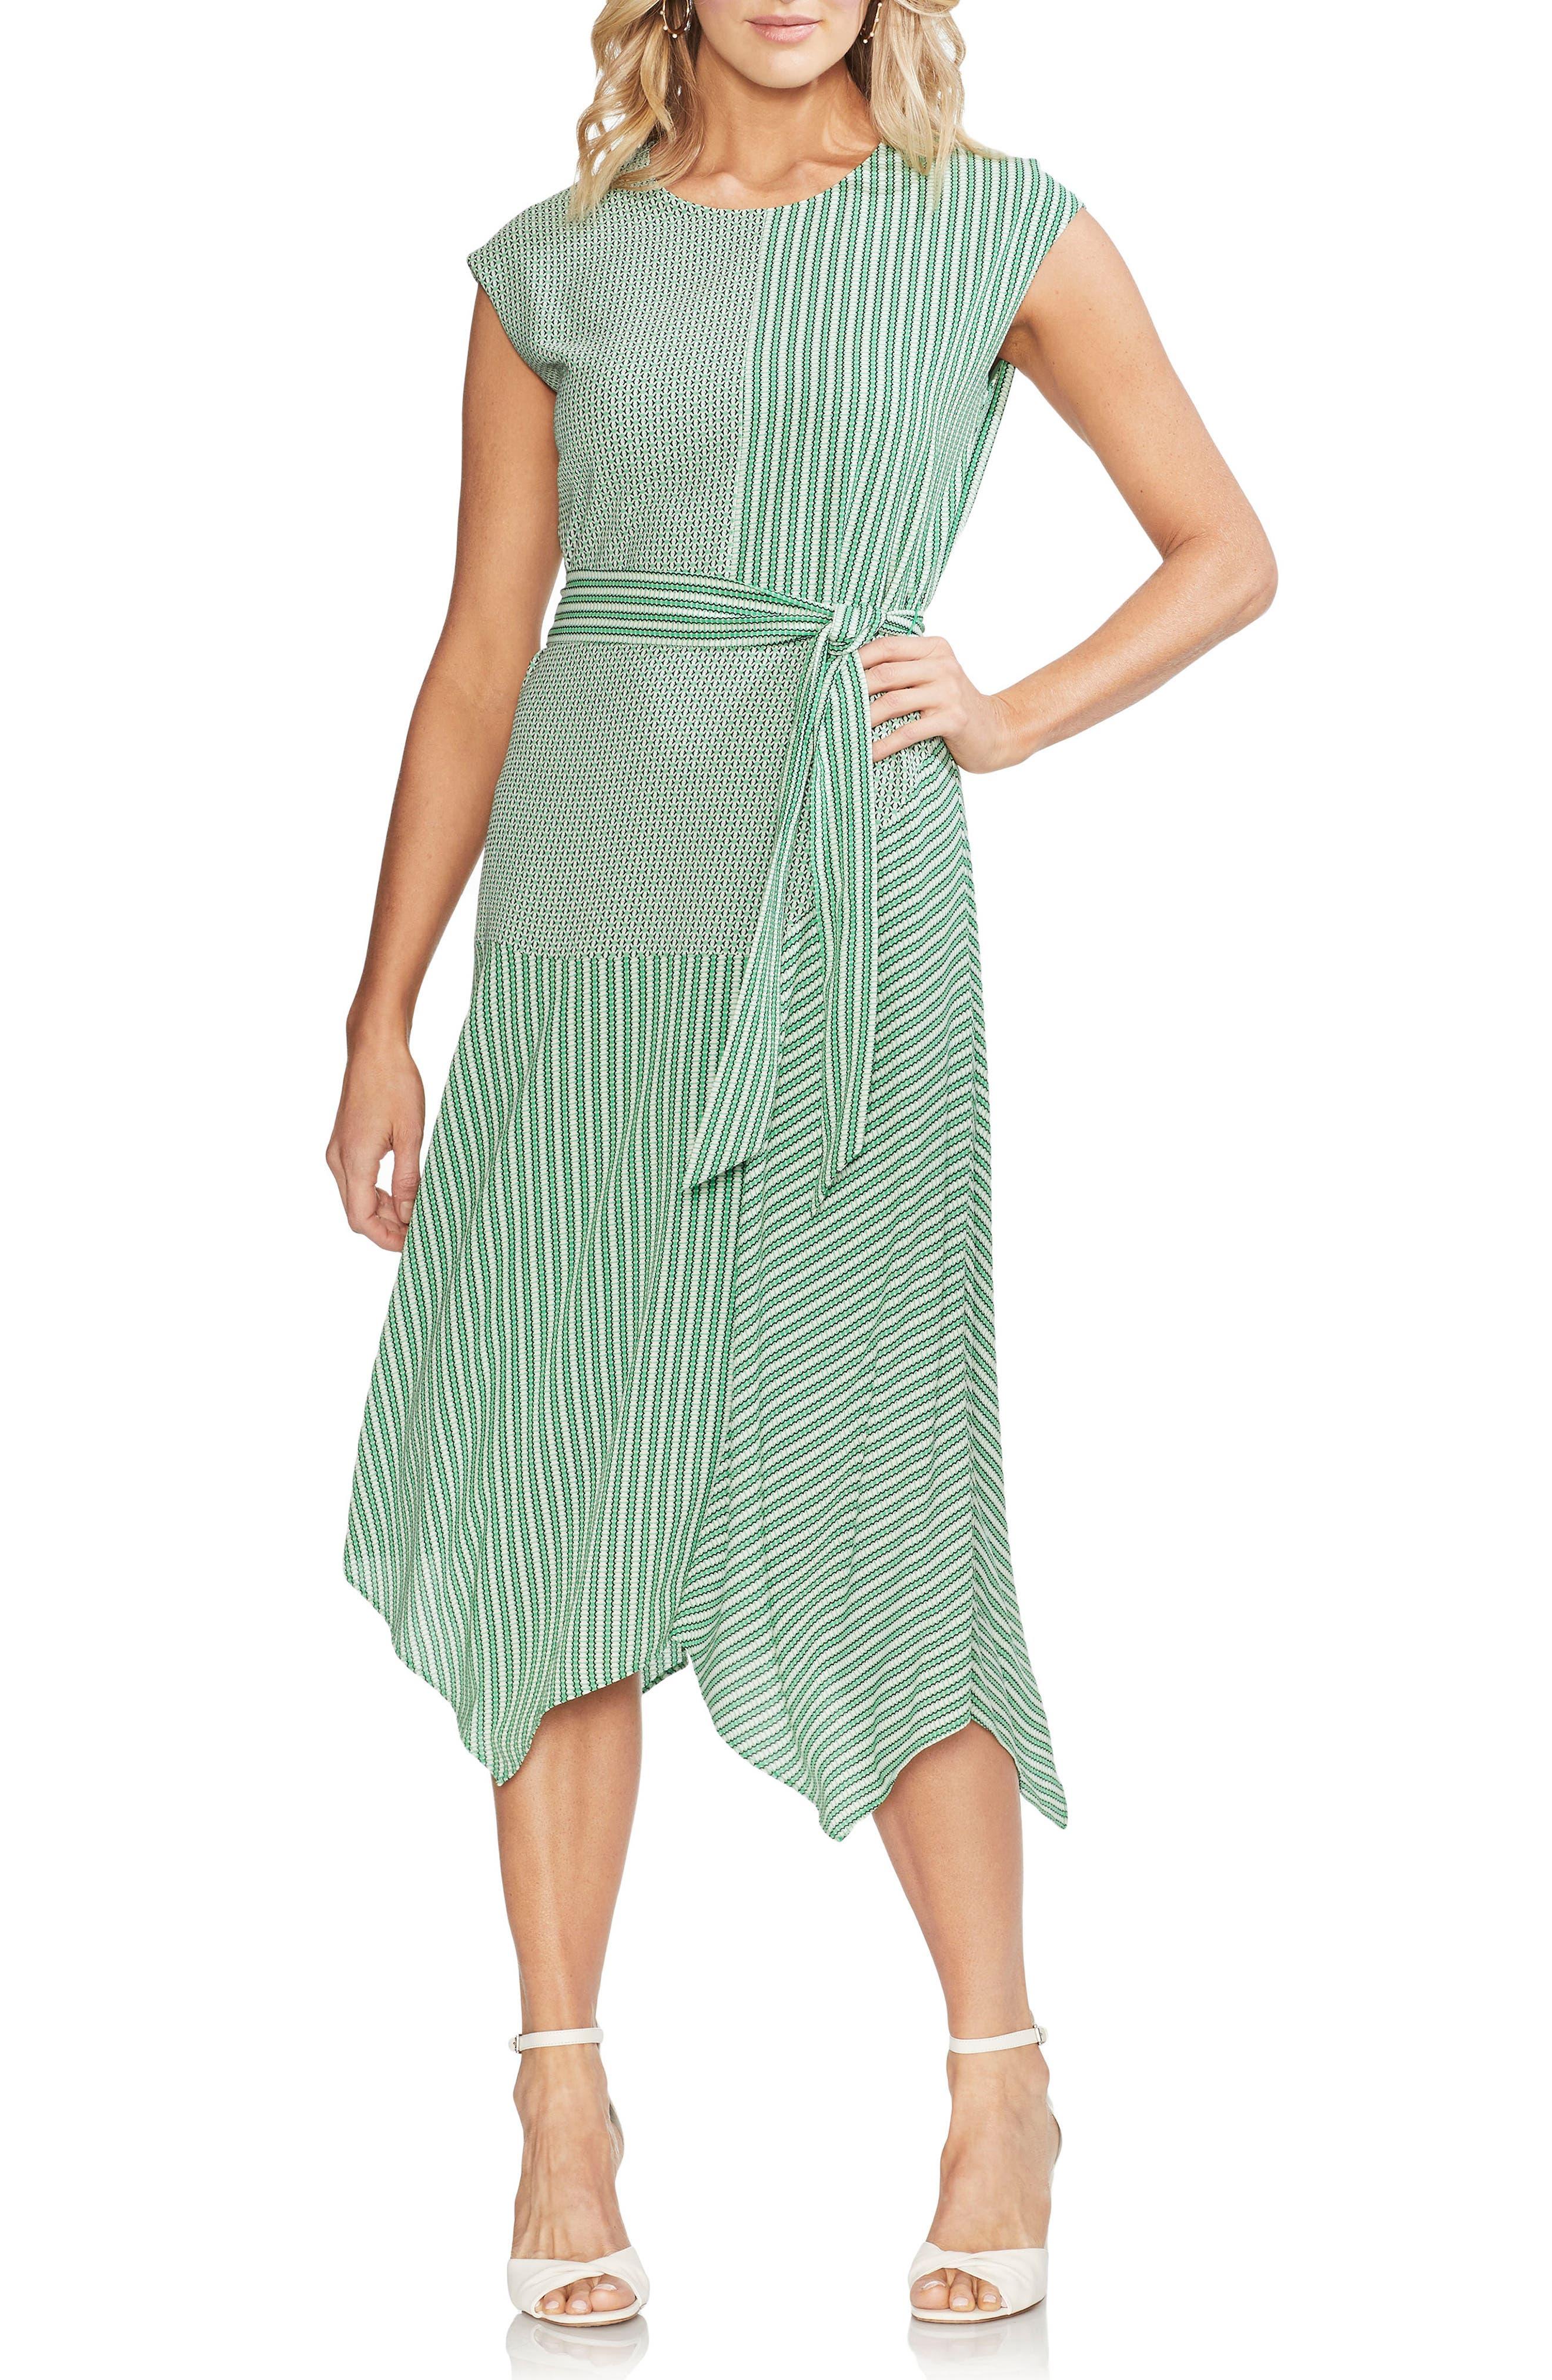 Vince Camuto Linear Motion Midi Dress, Green